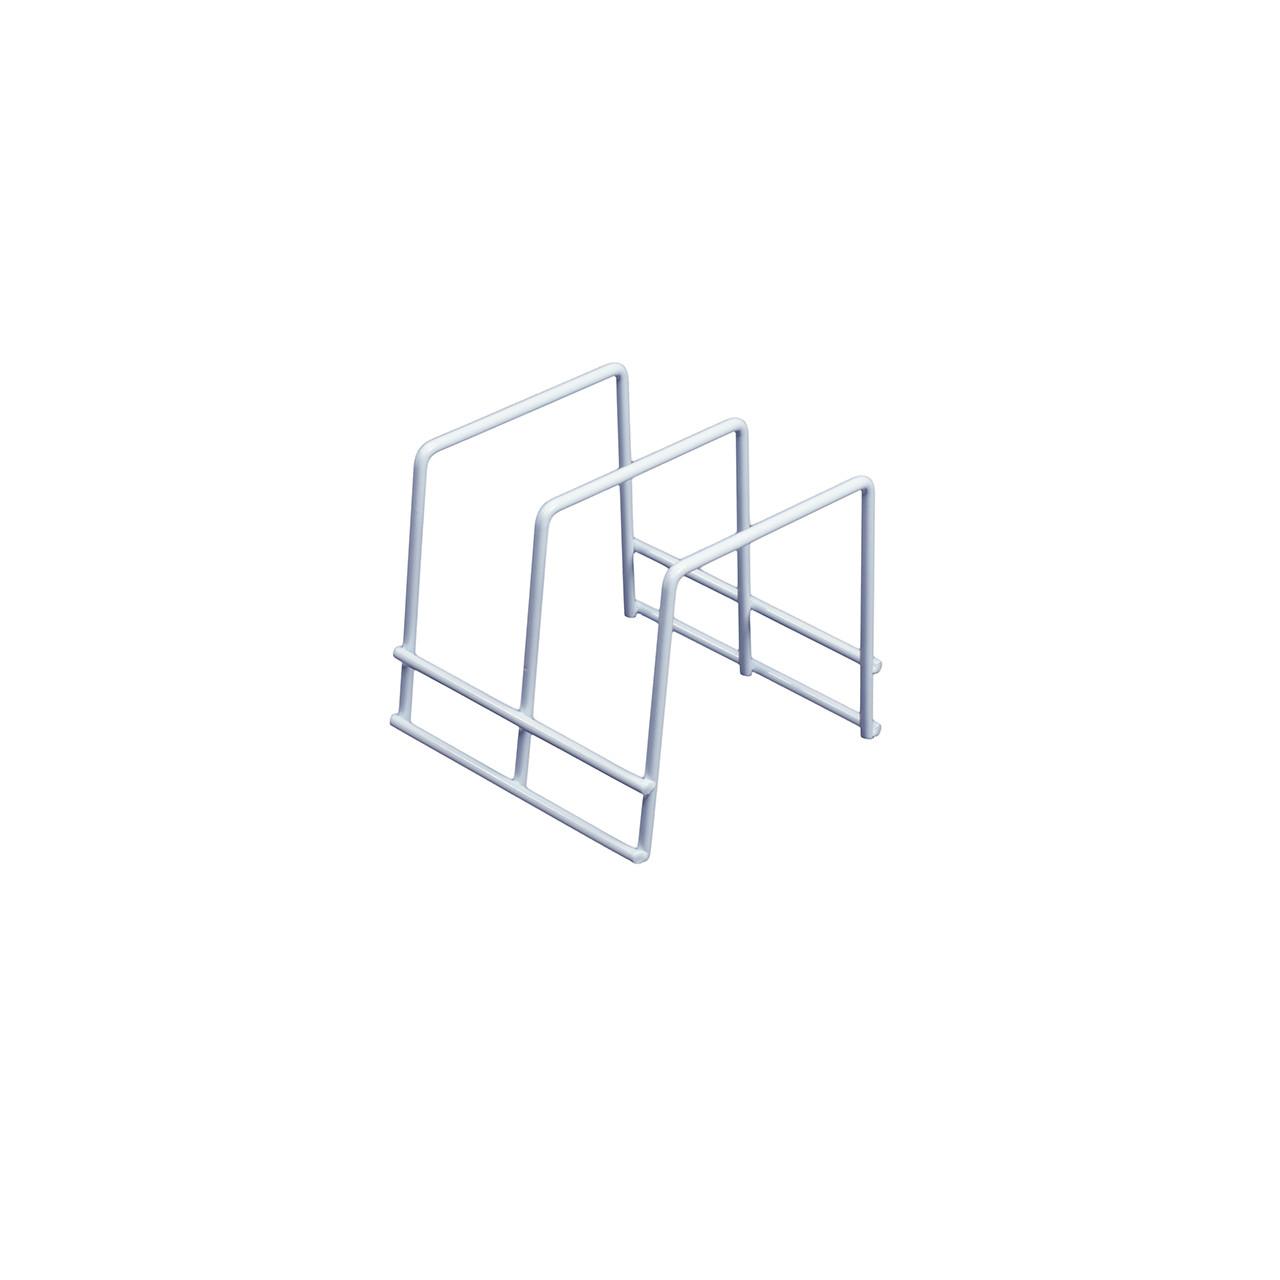 Kitchen Divider - 2 Sort